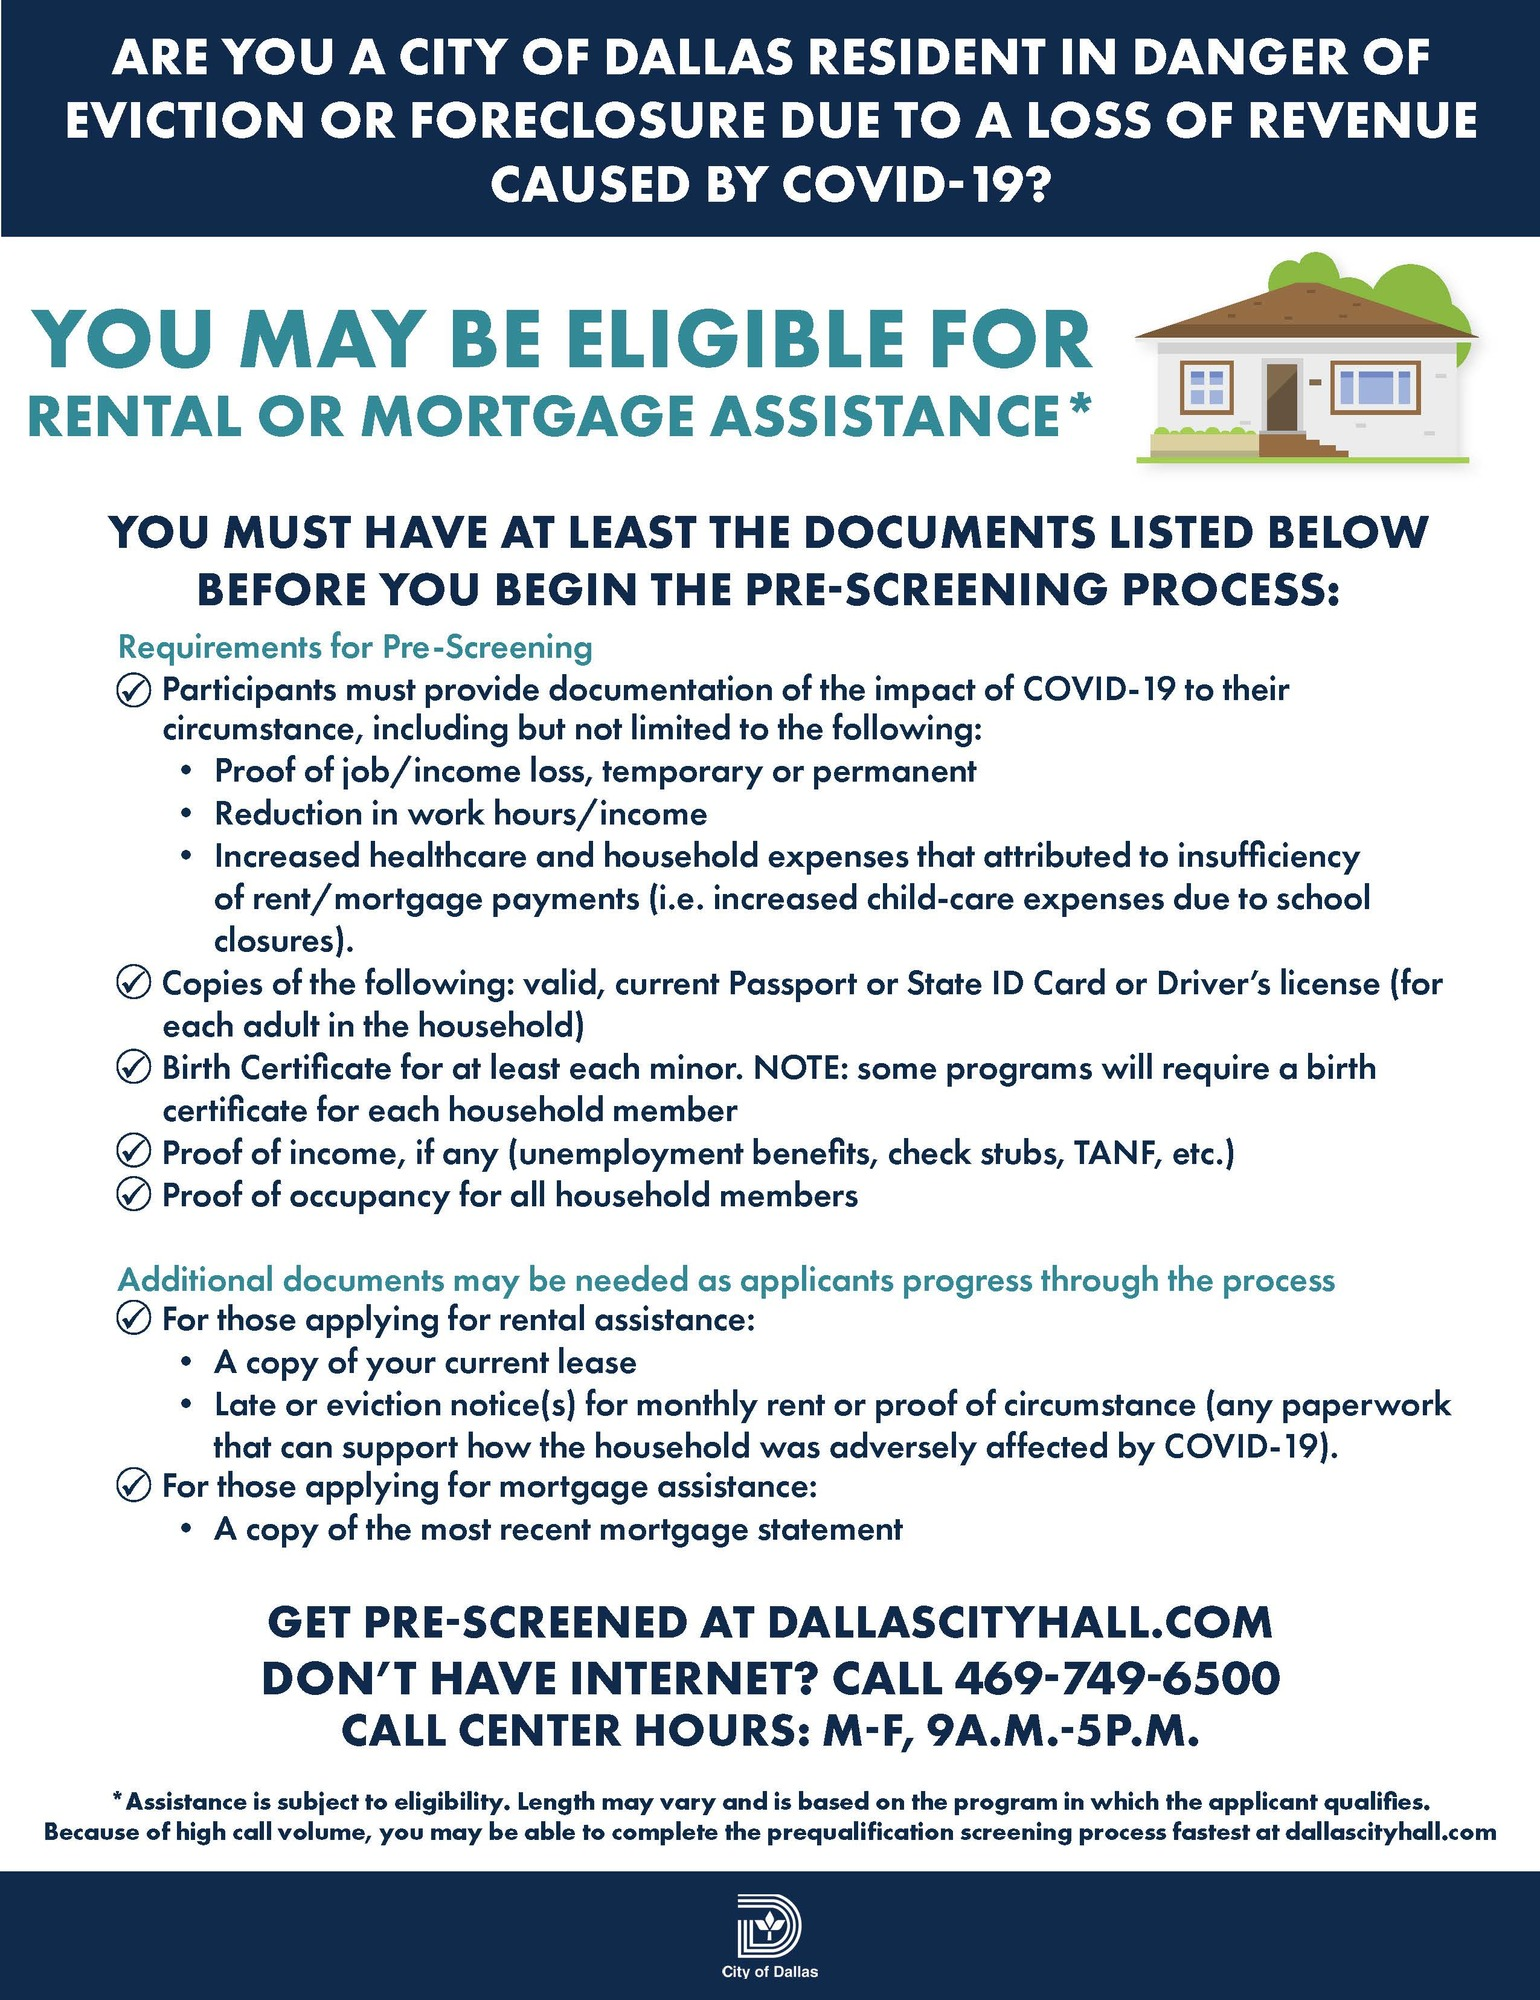 RentalMortgageAssistance - Checklist